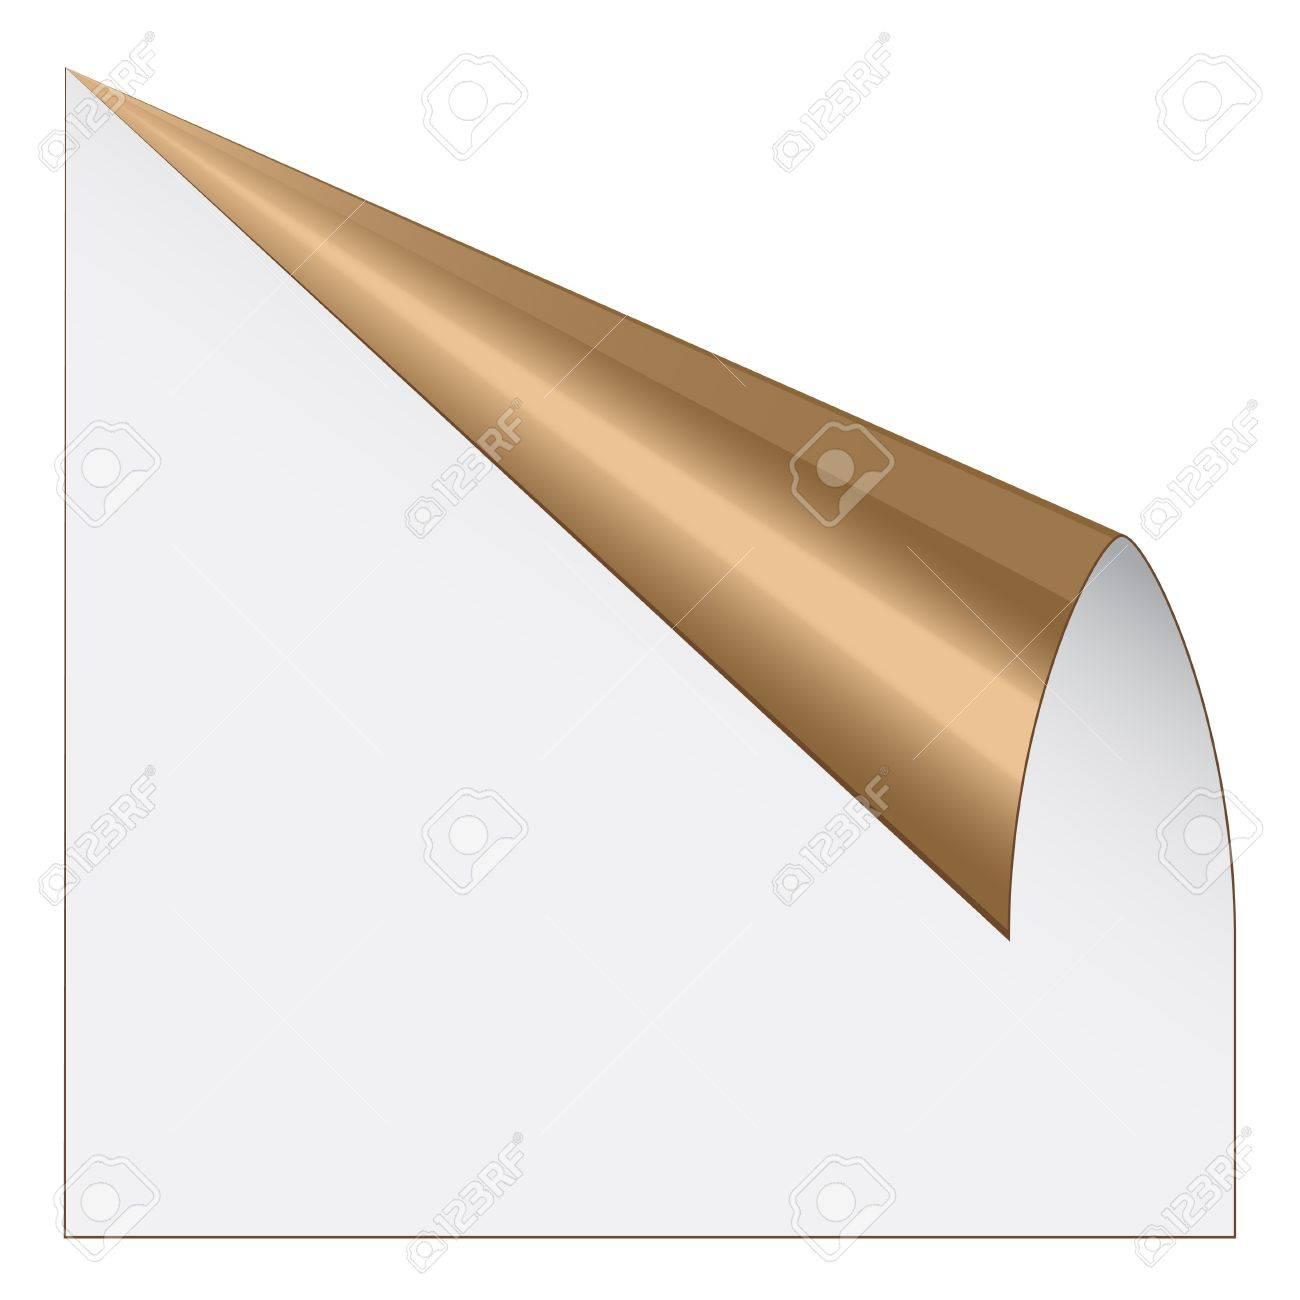 vector page corner with metallic backs Stock Vector - 11504038